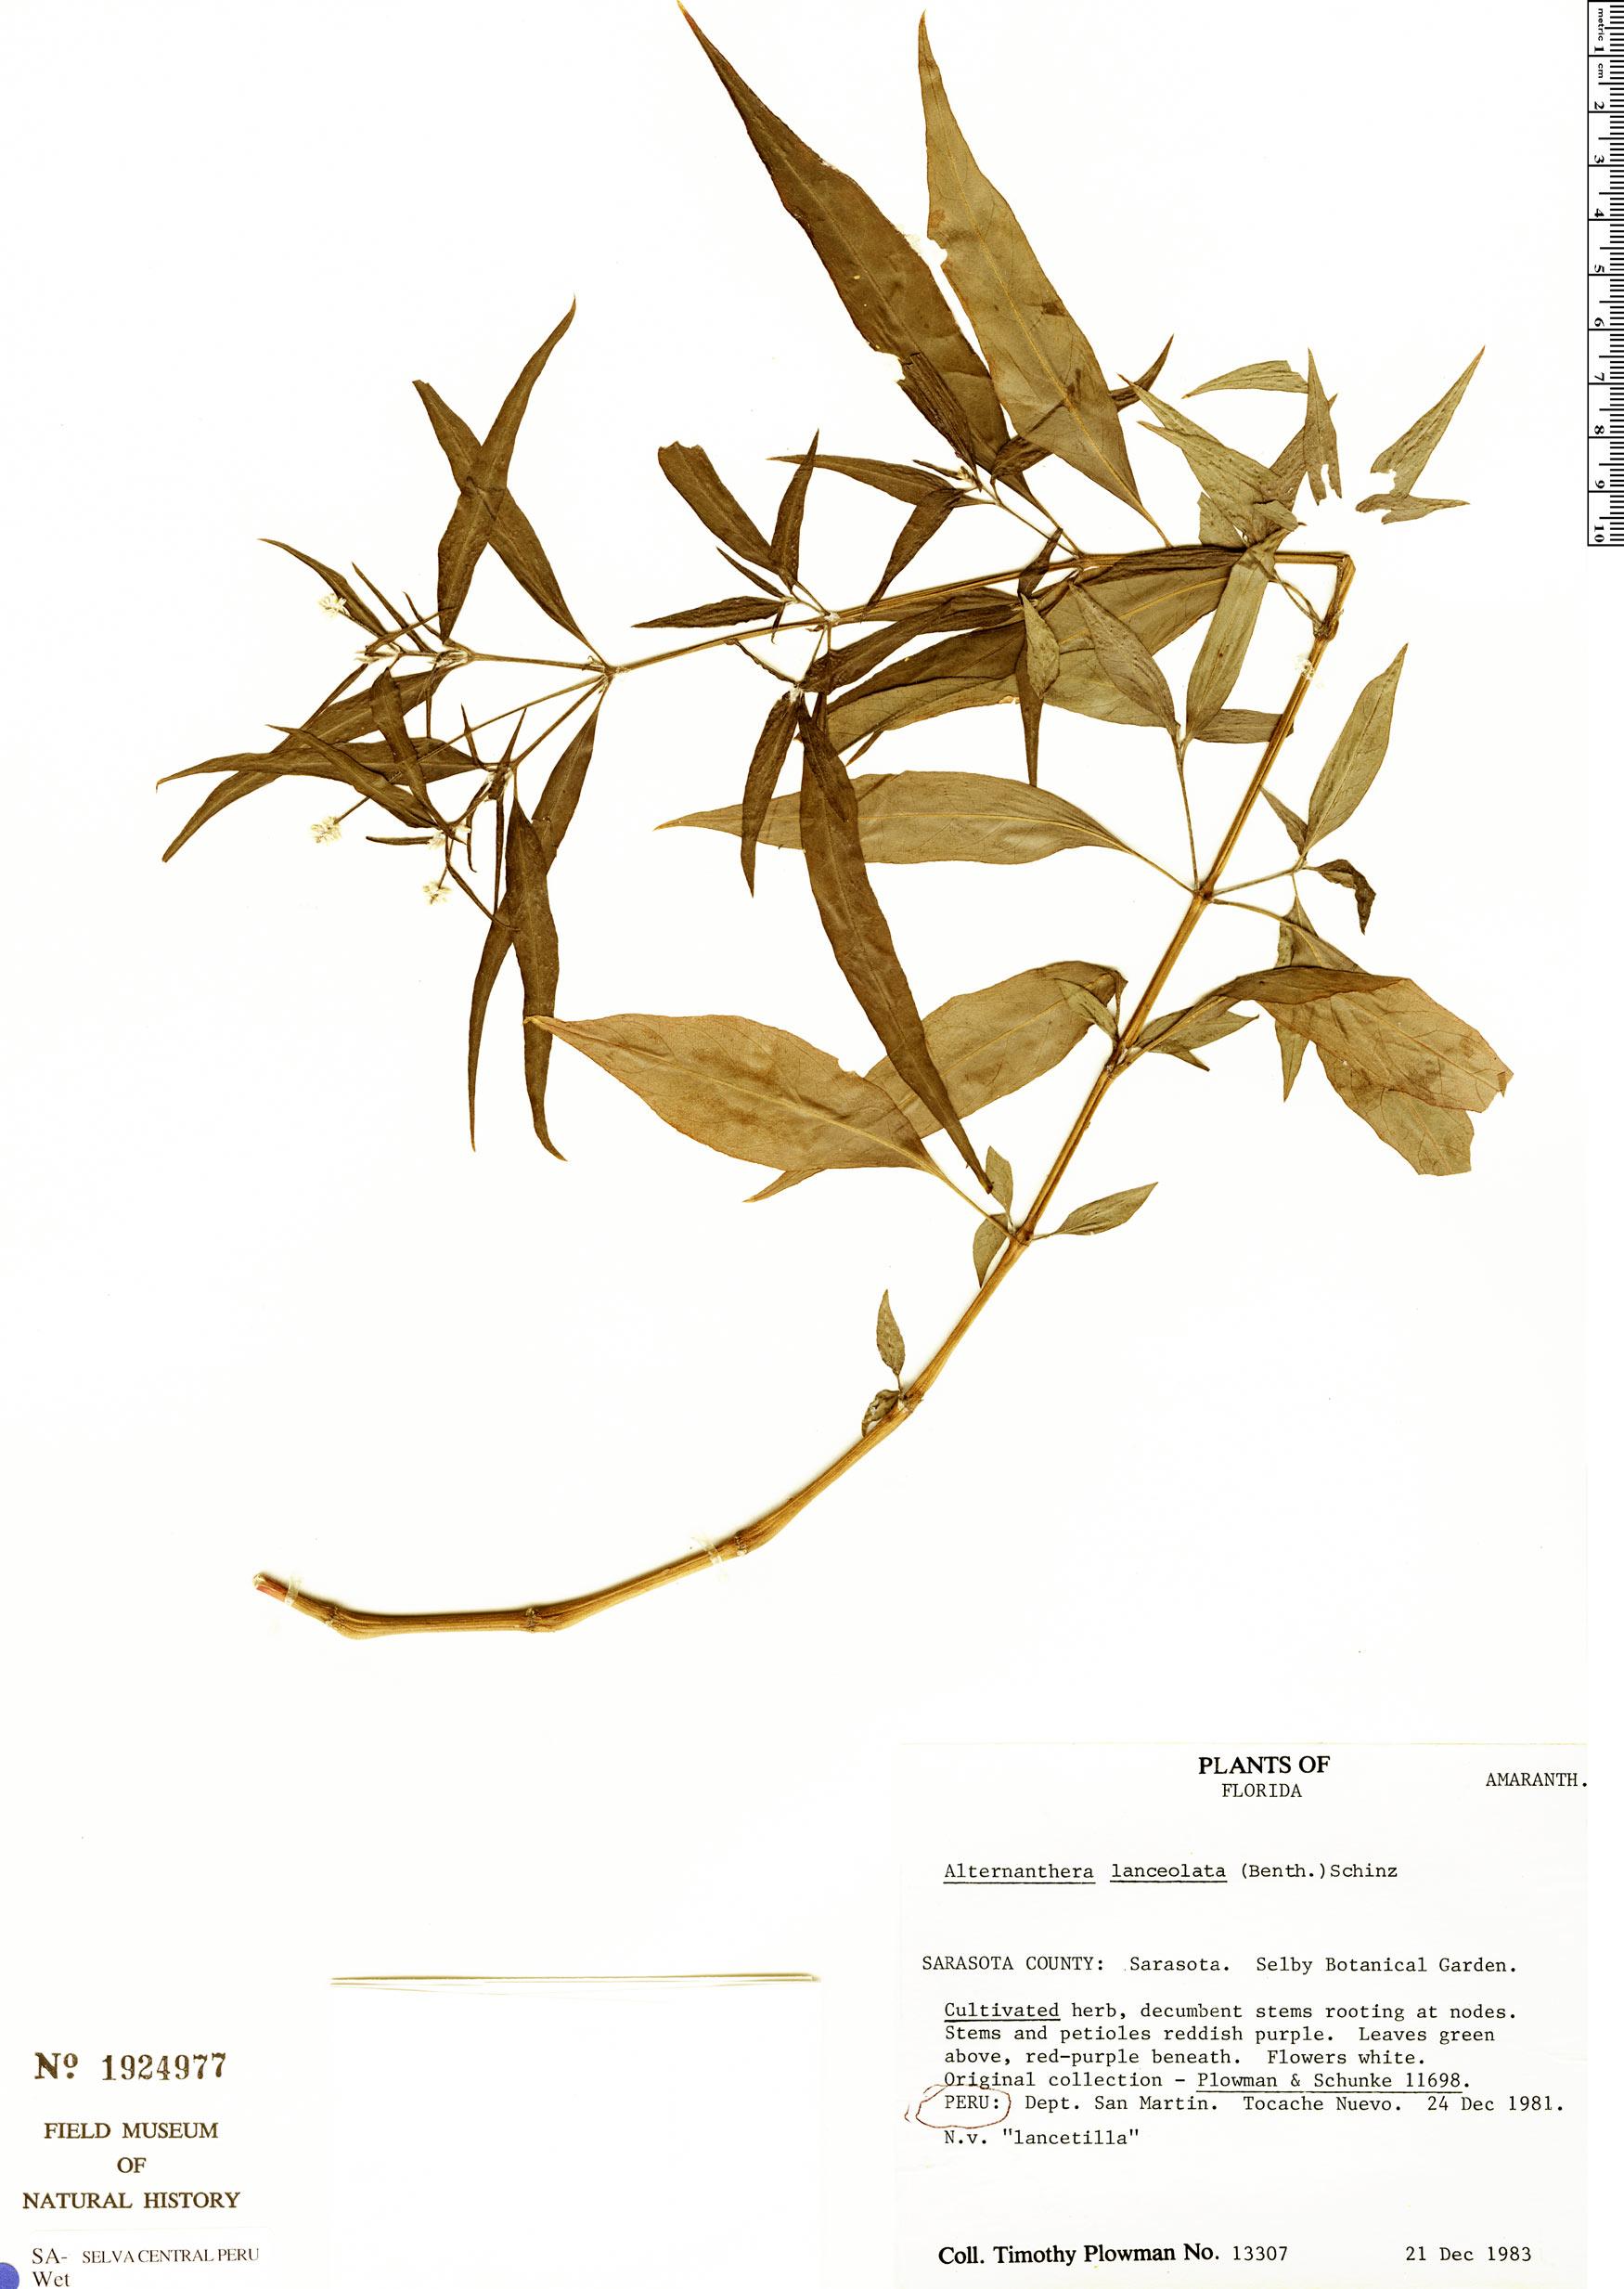 Specimen: Alternanthera lanceolata